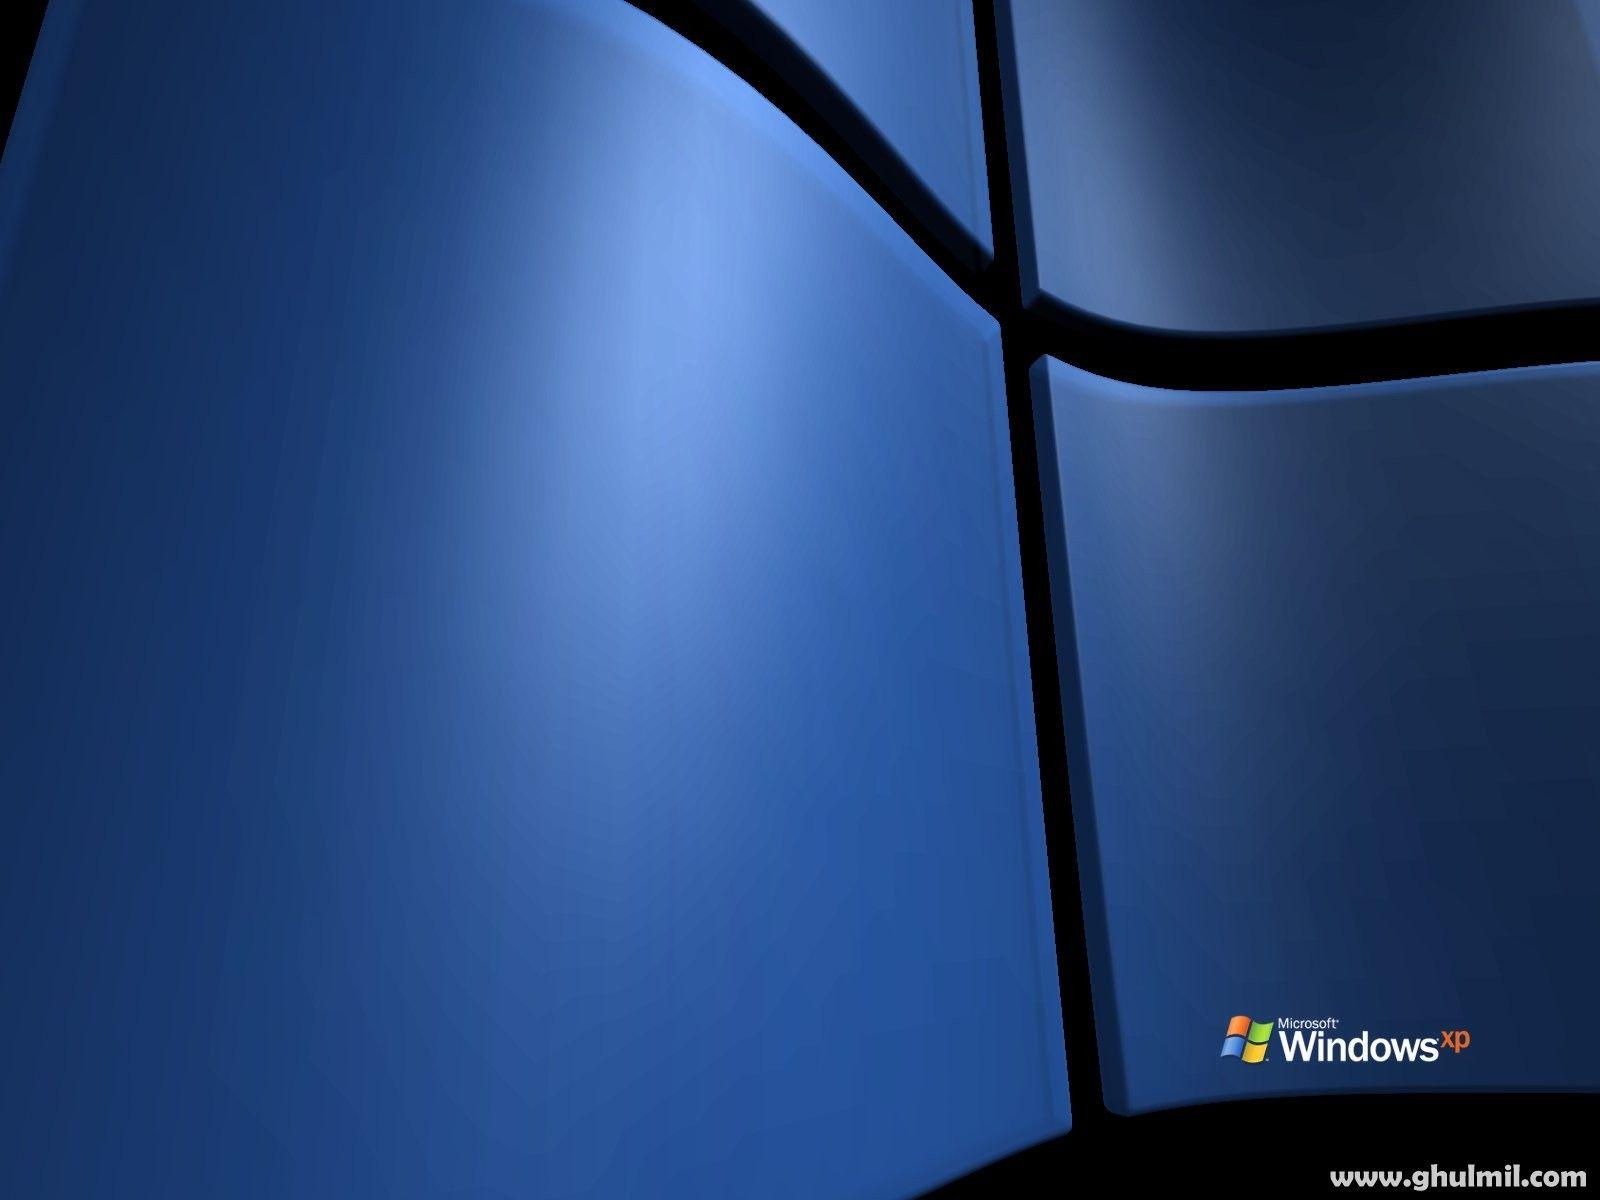 Windows Xp 483463 Hd Wallpaper Backgrounds Download